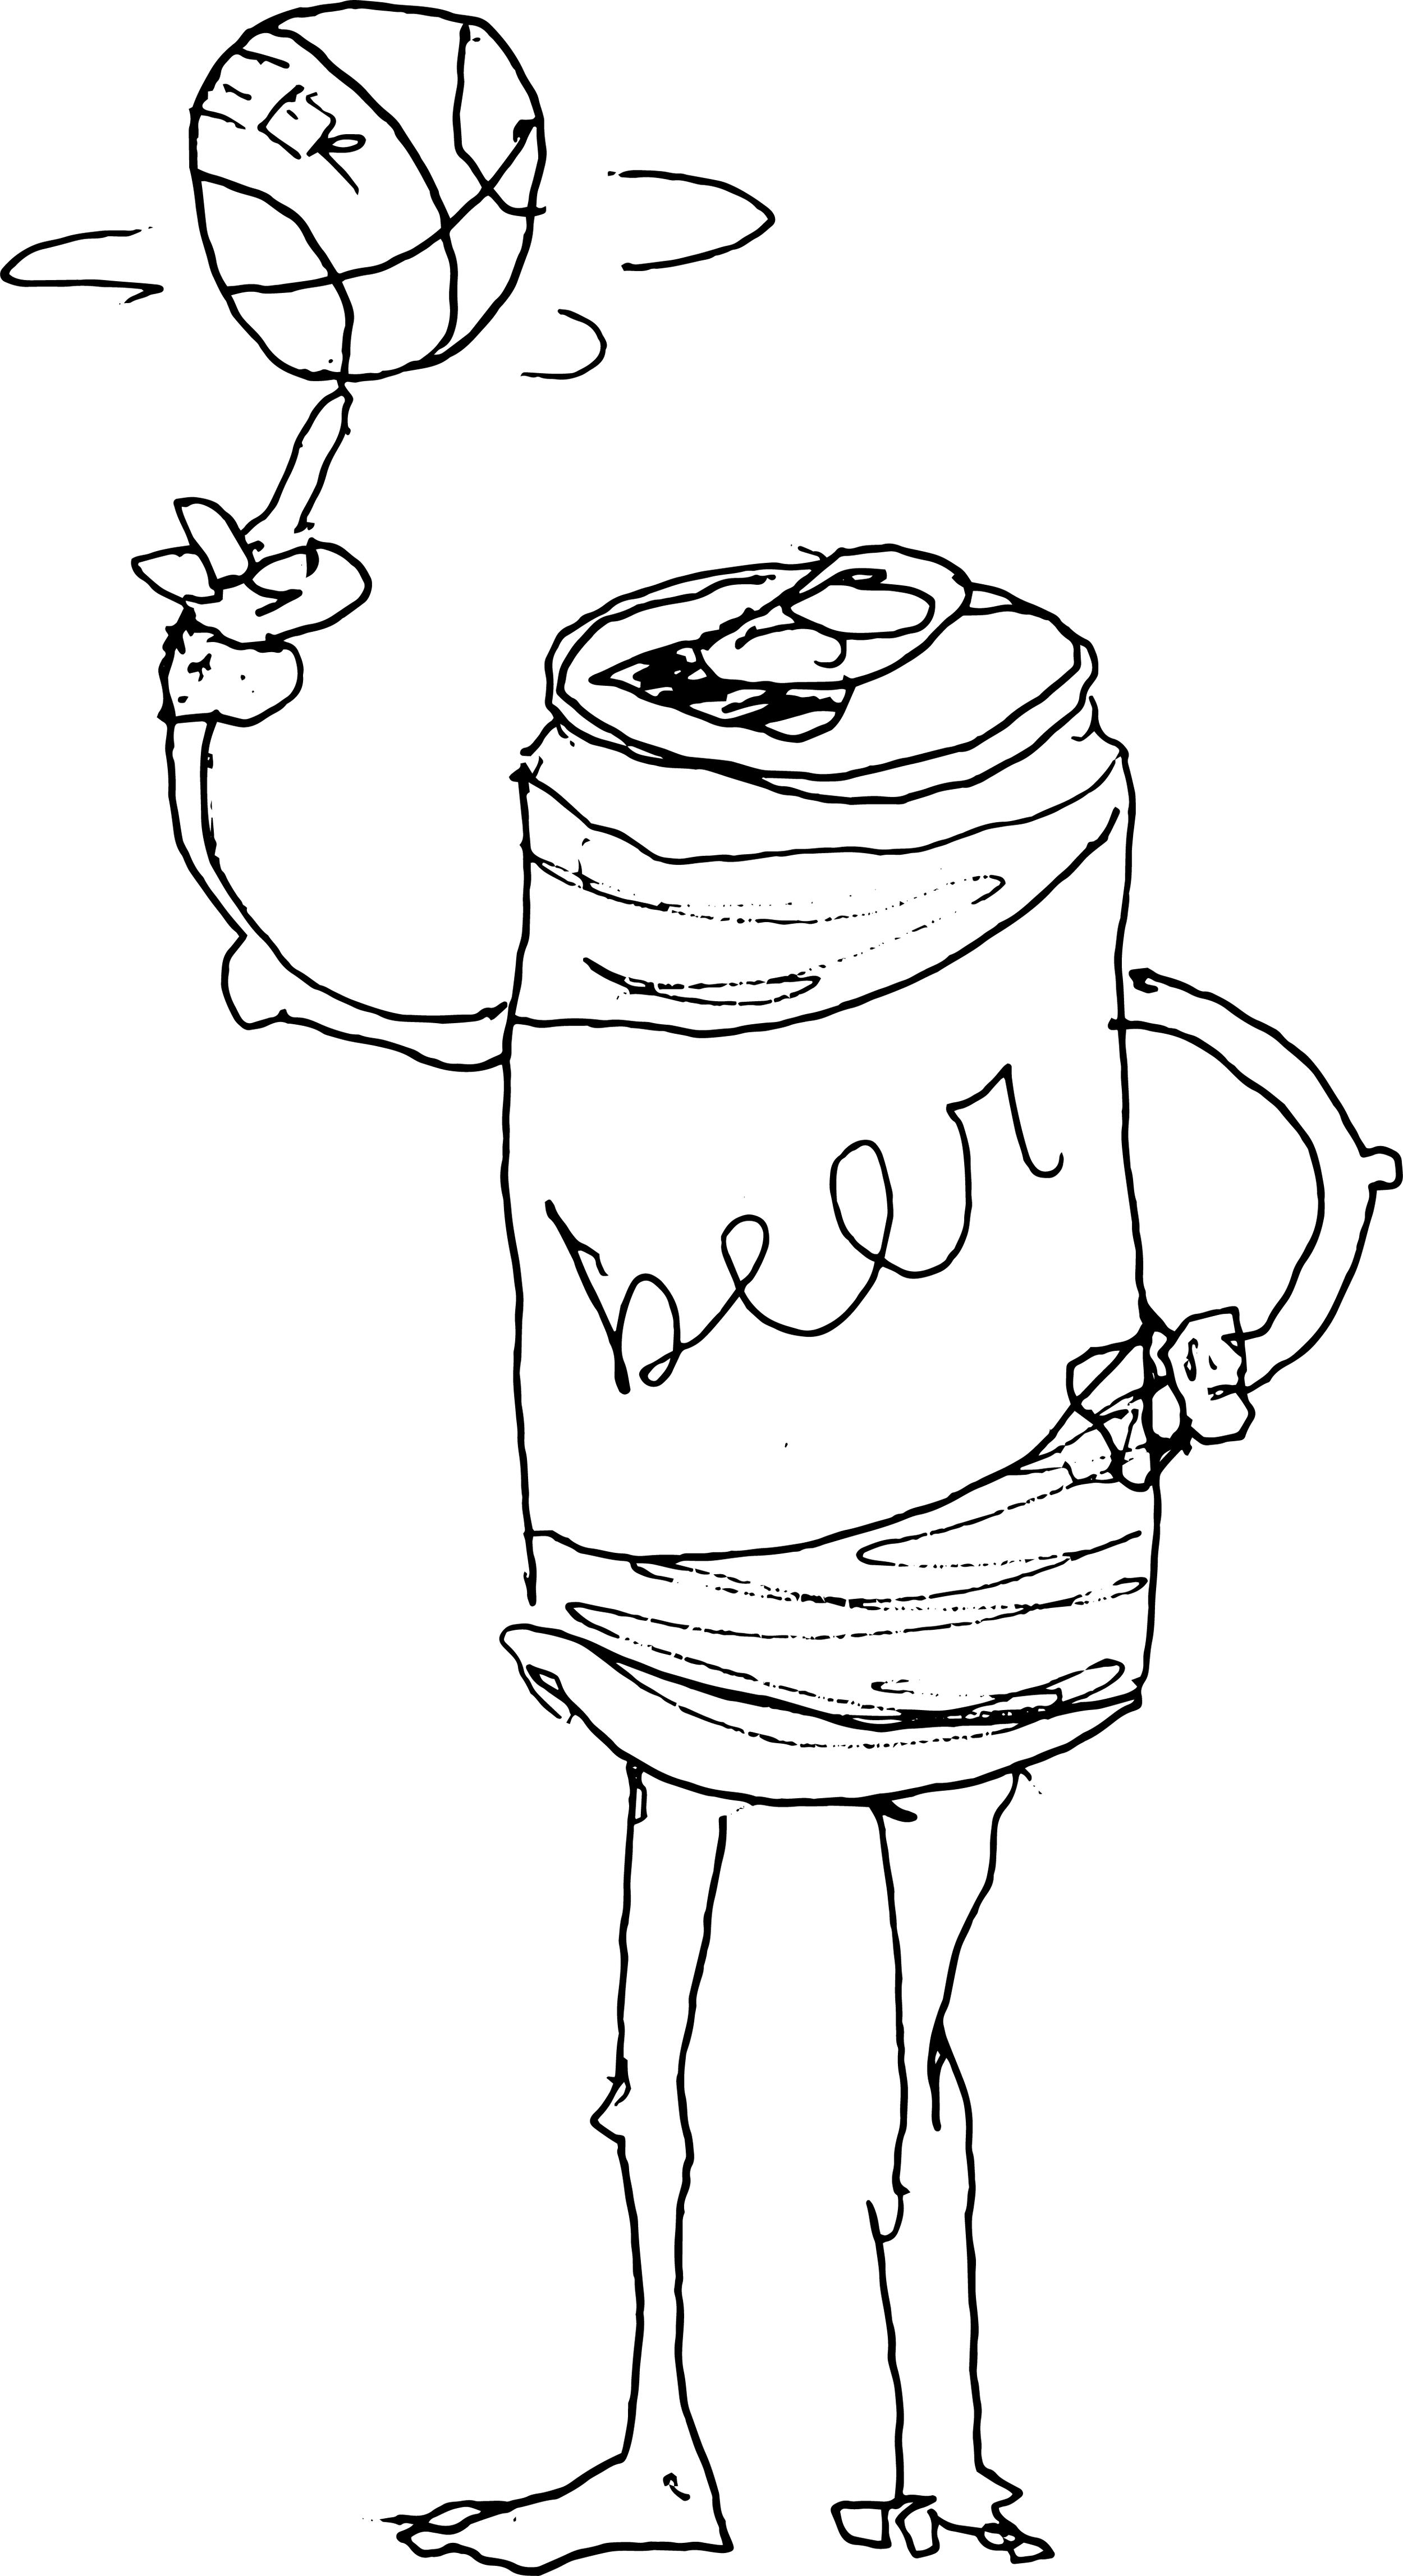 BeerDude-signature.png